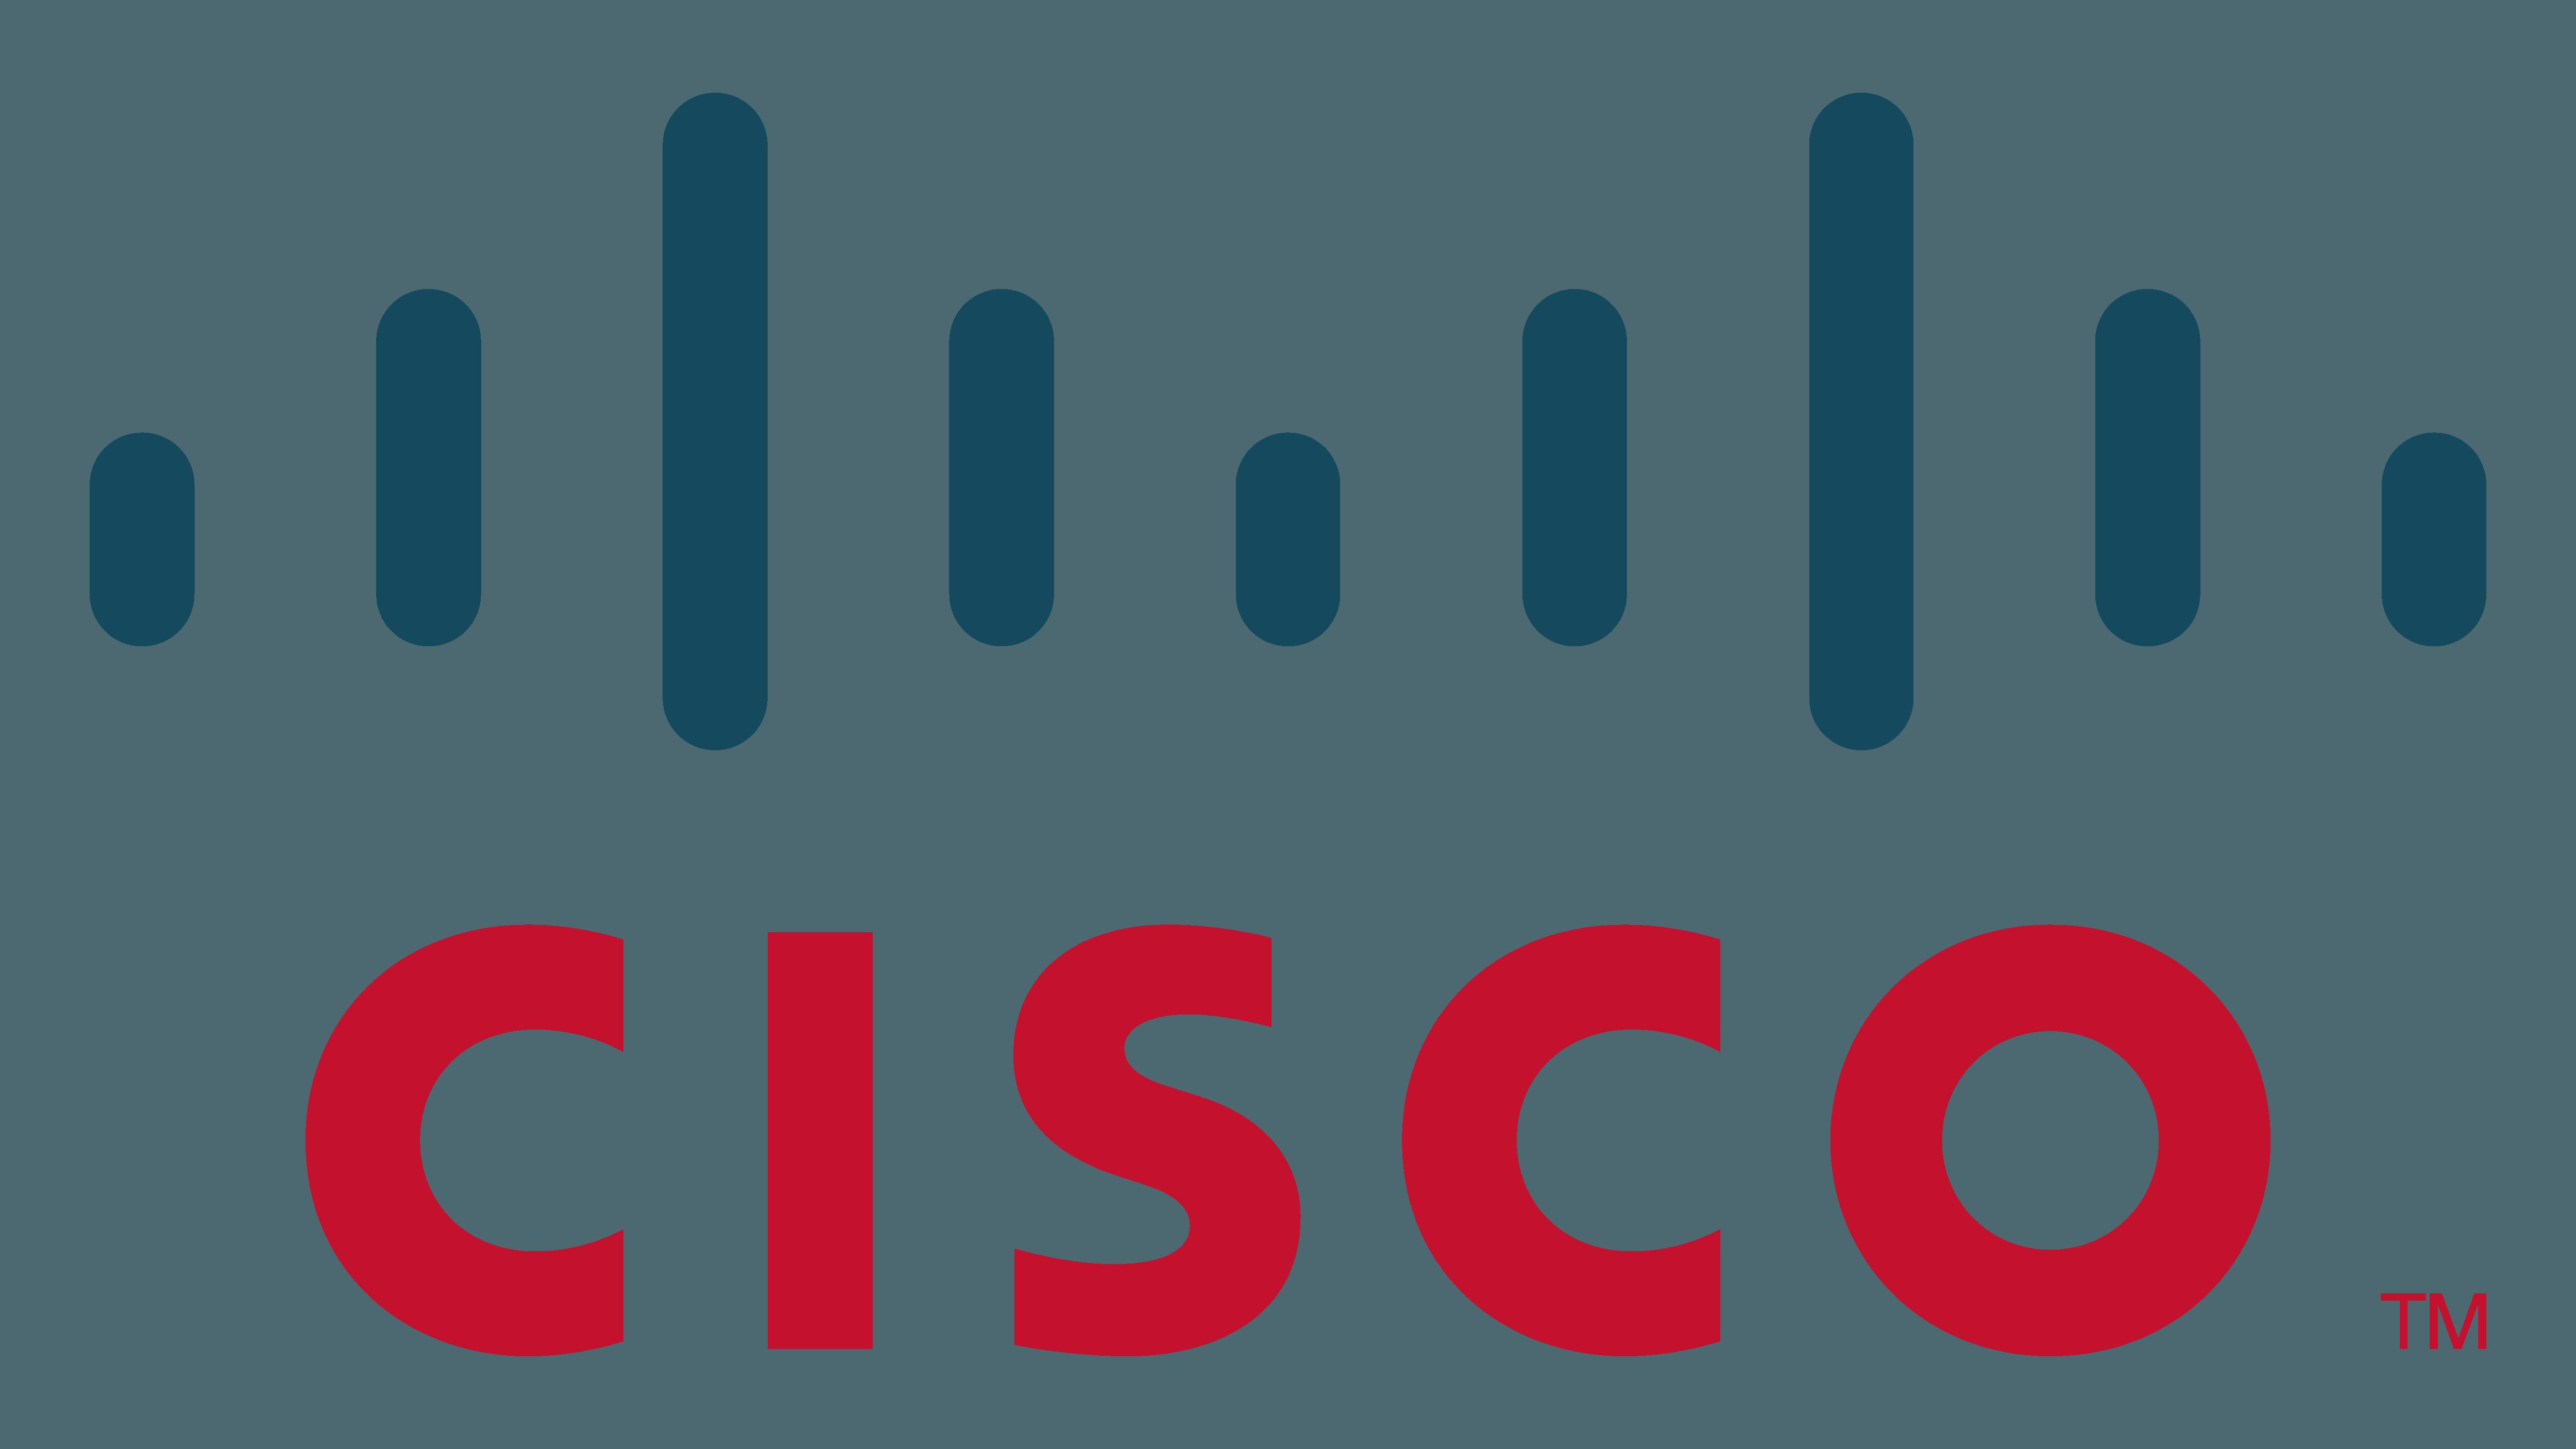 cisco_logo_emblem_logotype